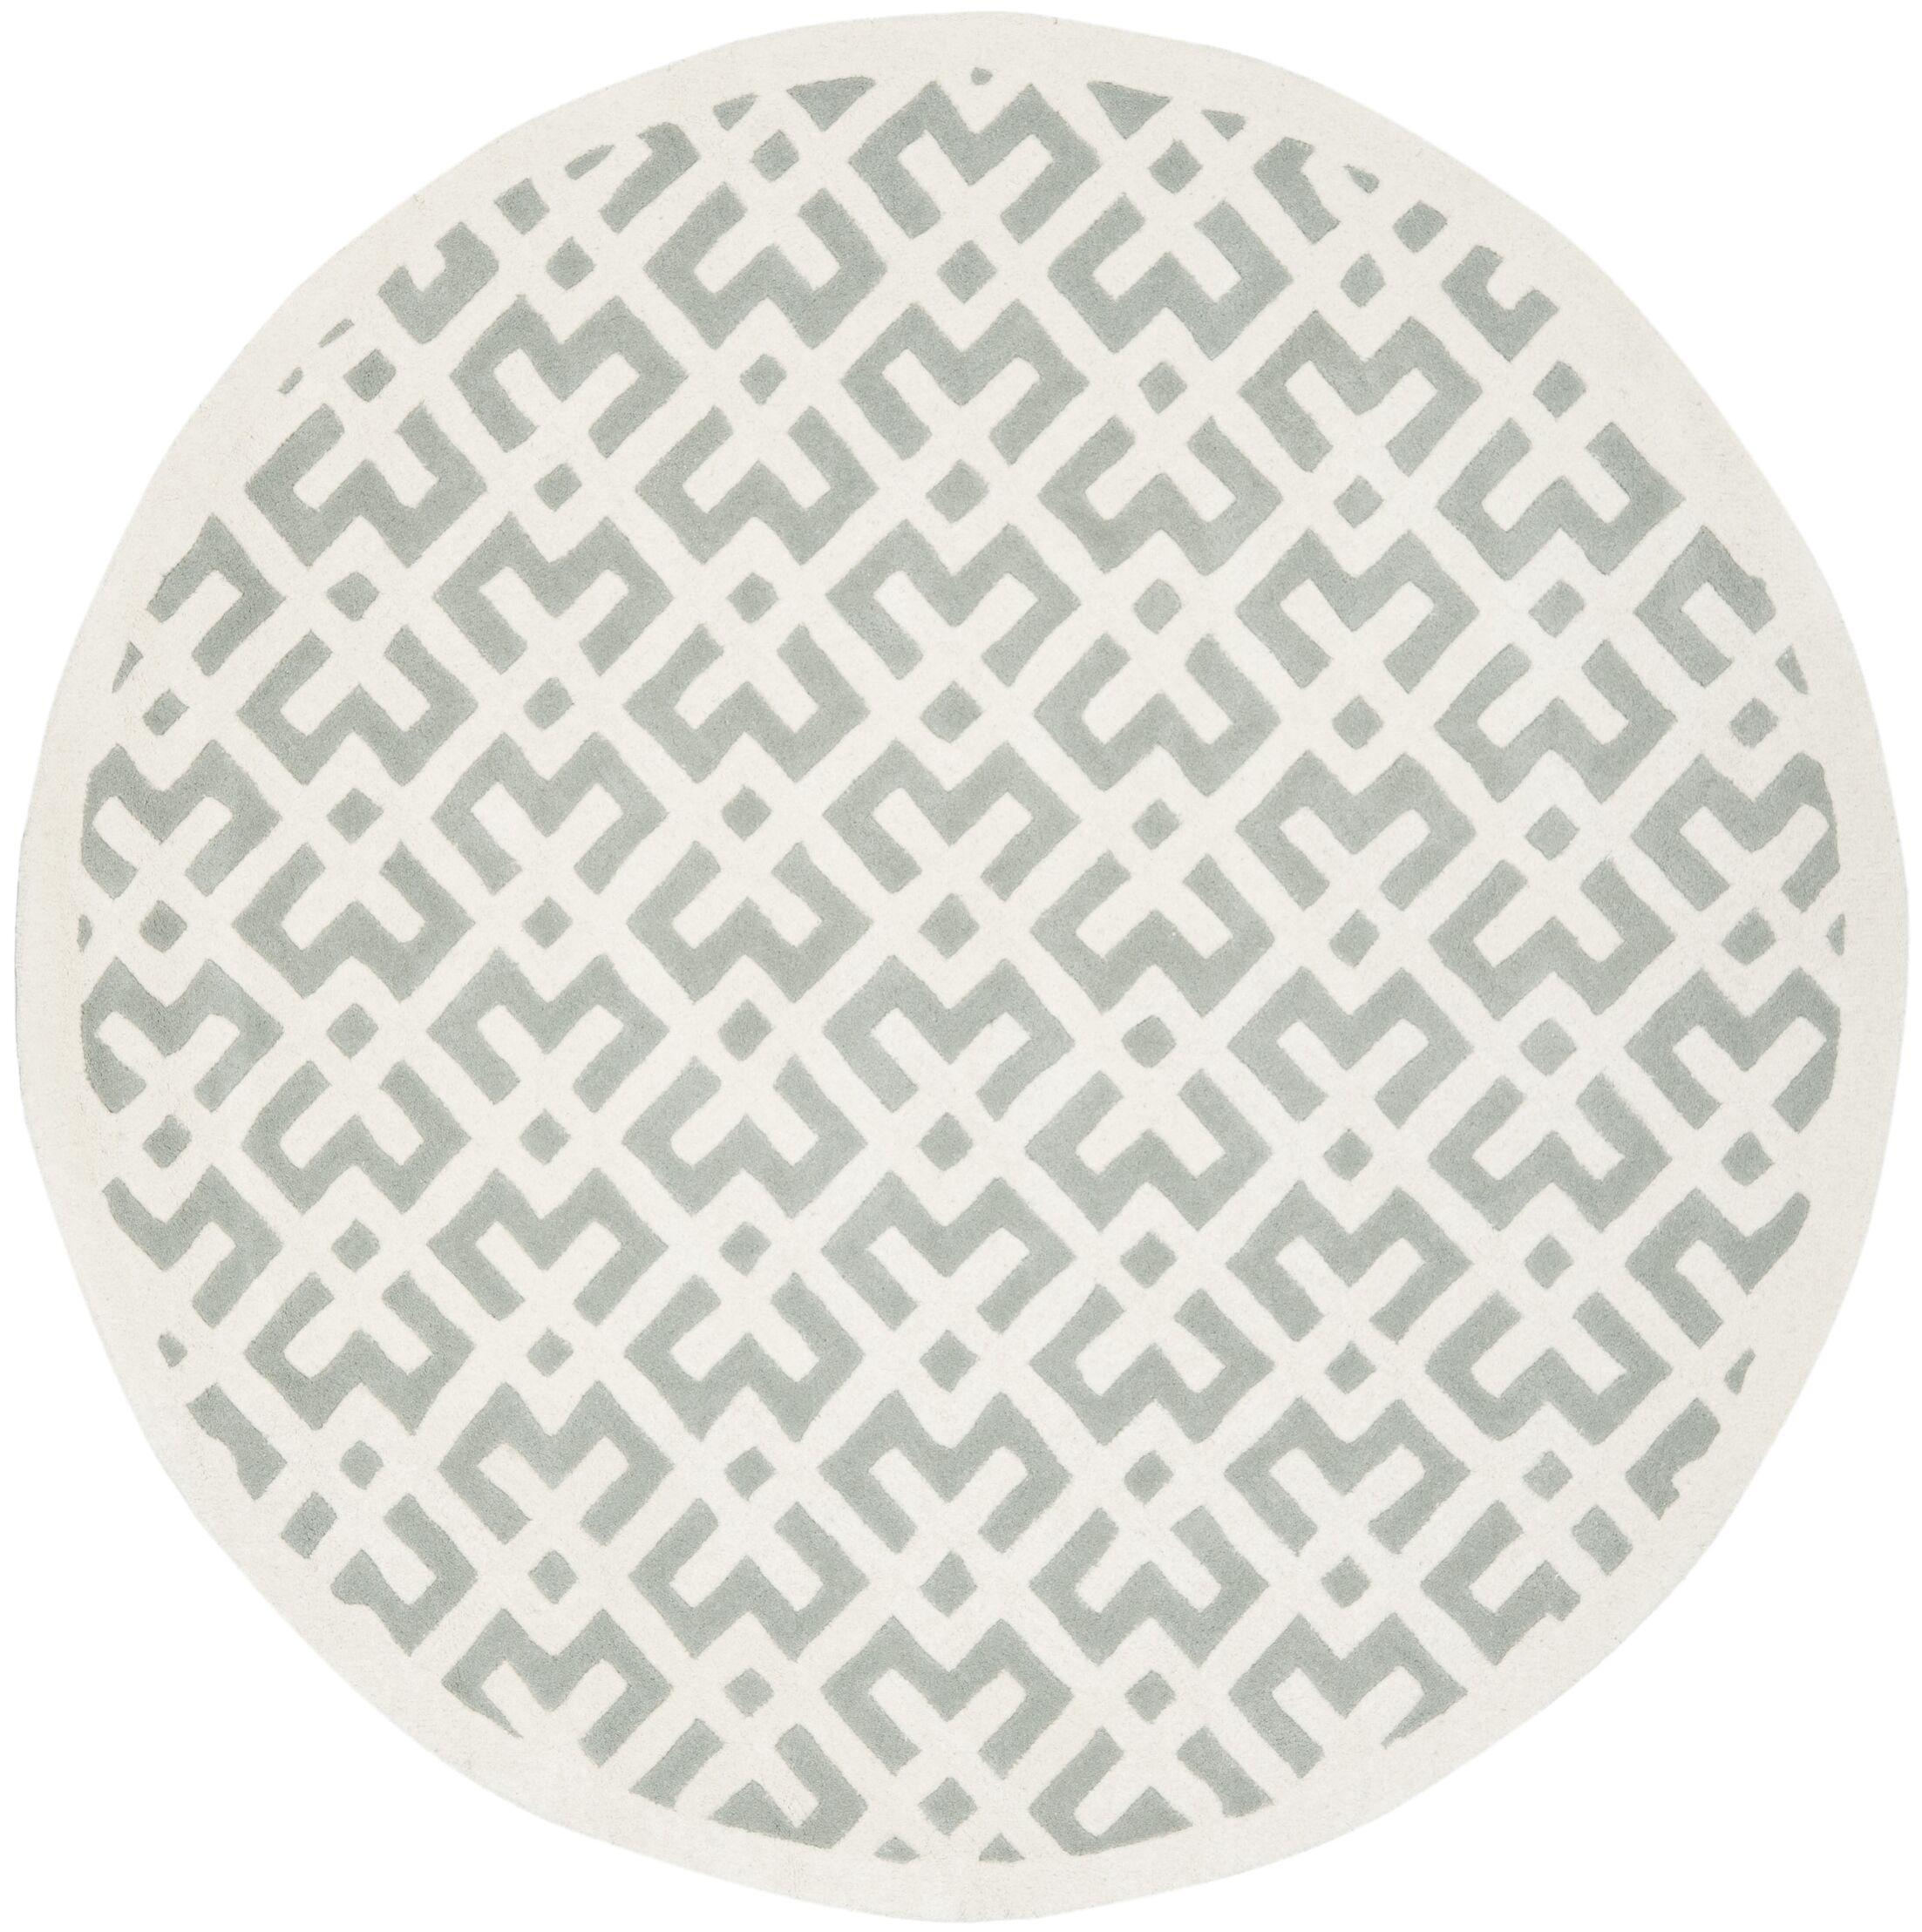 Wilkin Grey / Ivory Rug Rug Size: Rectangle 8' x 10'